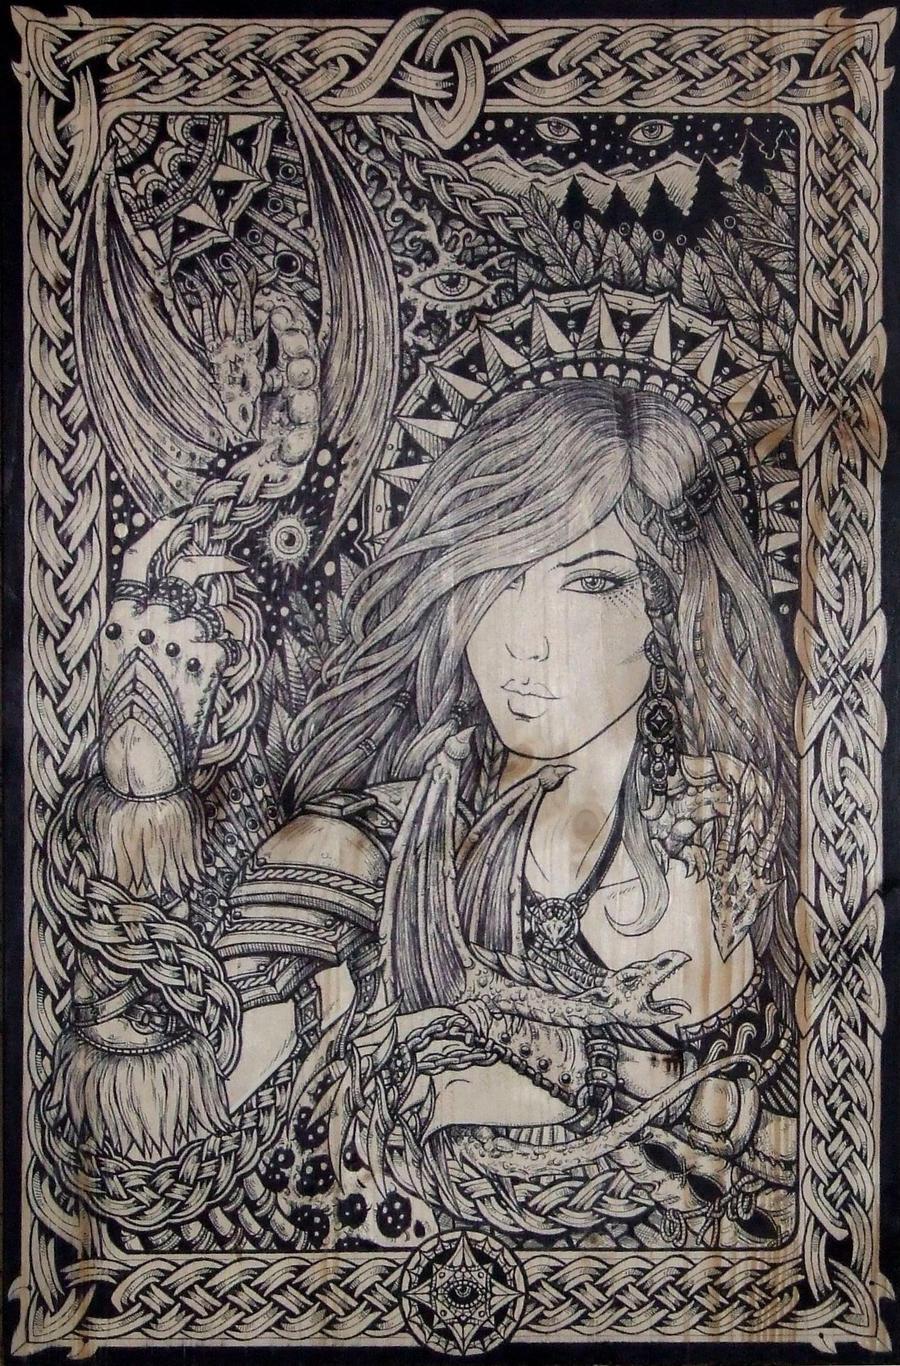 Khaleesi by ZawArt